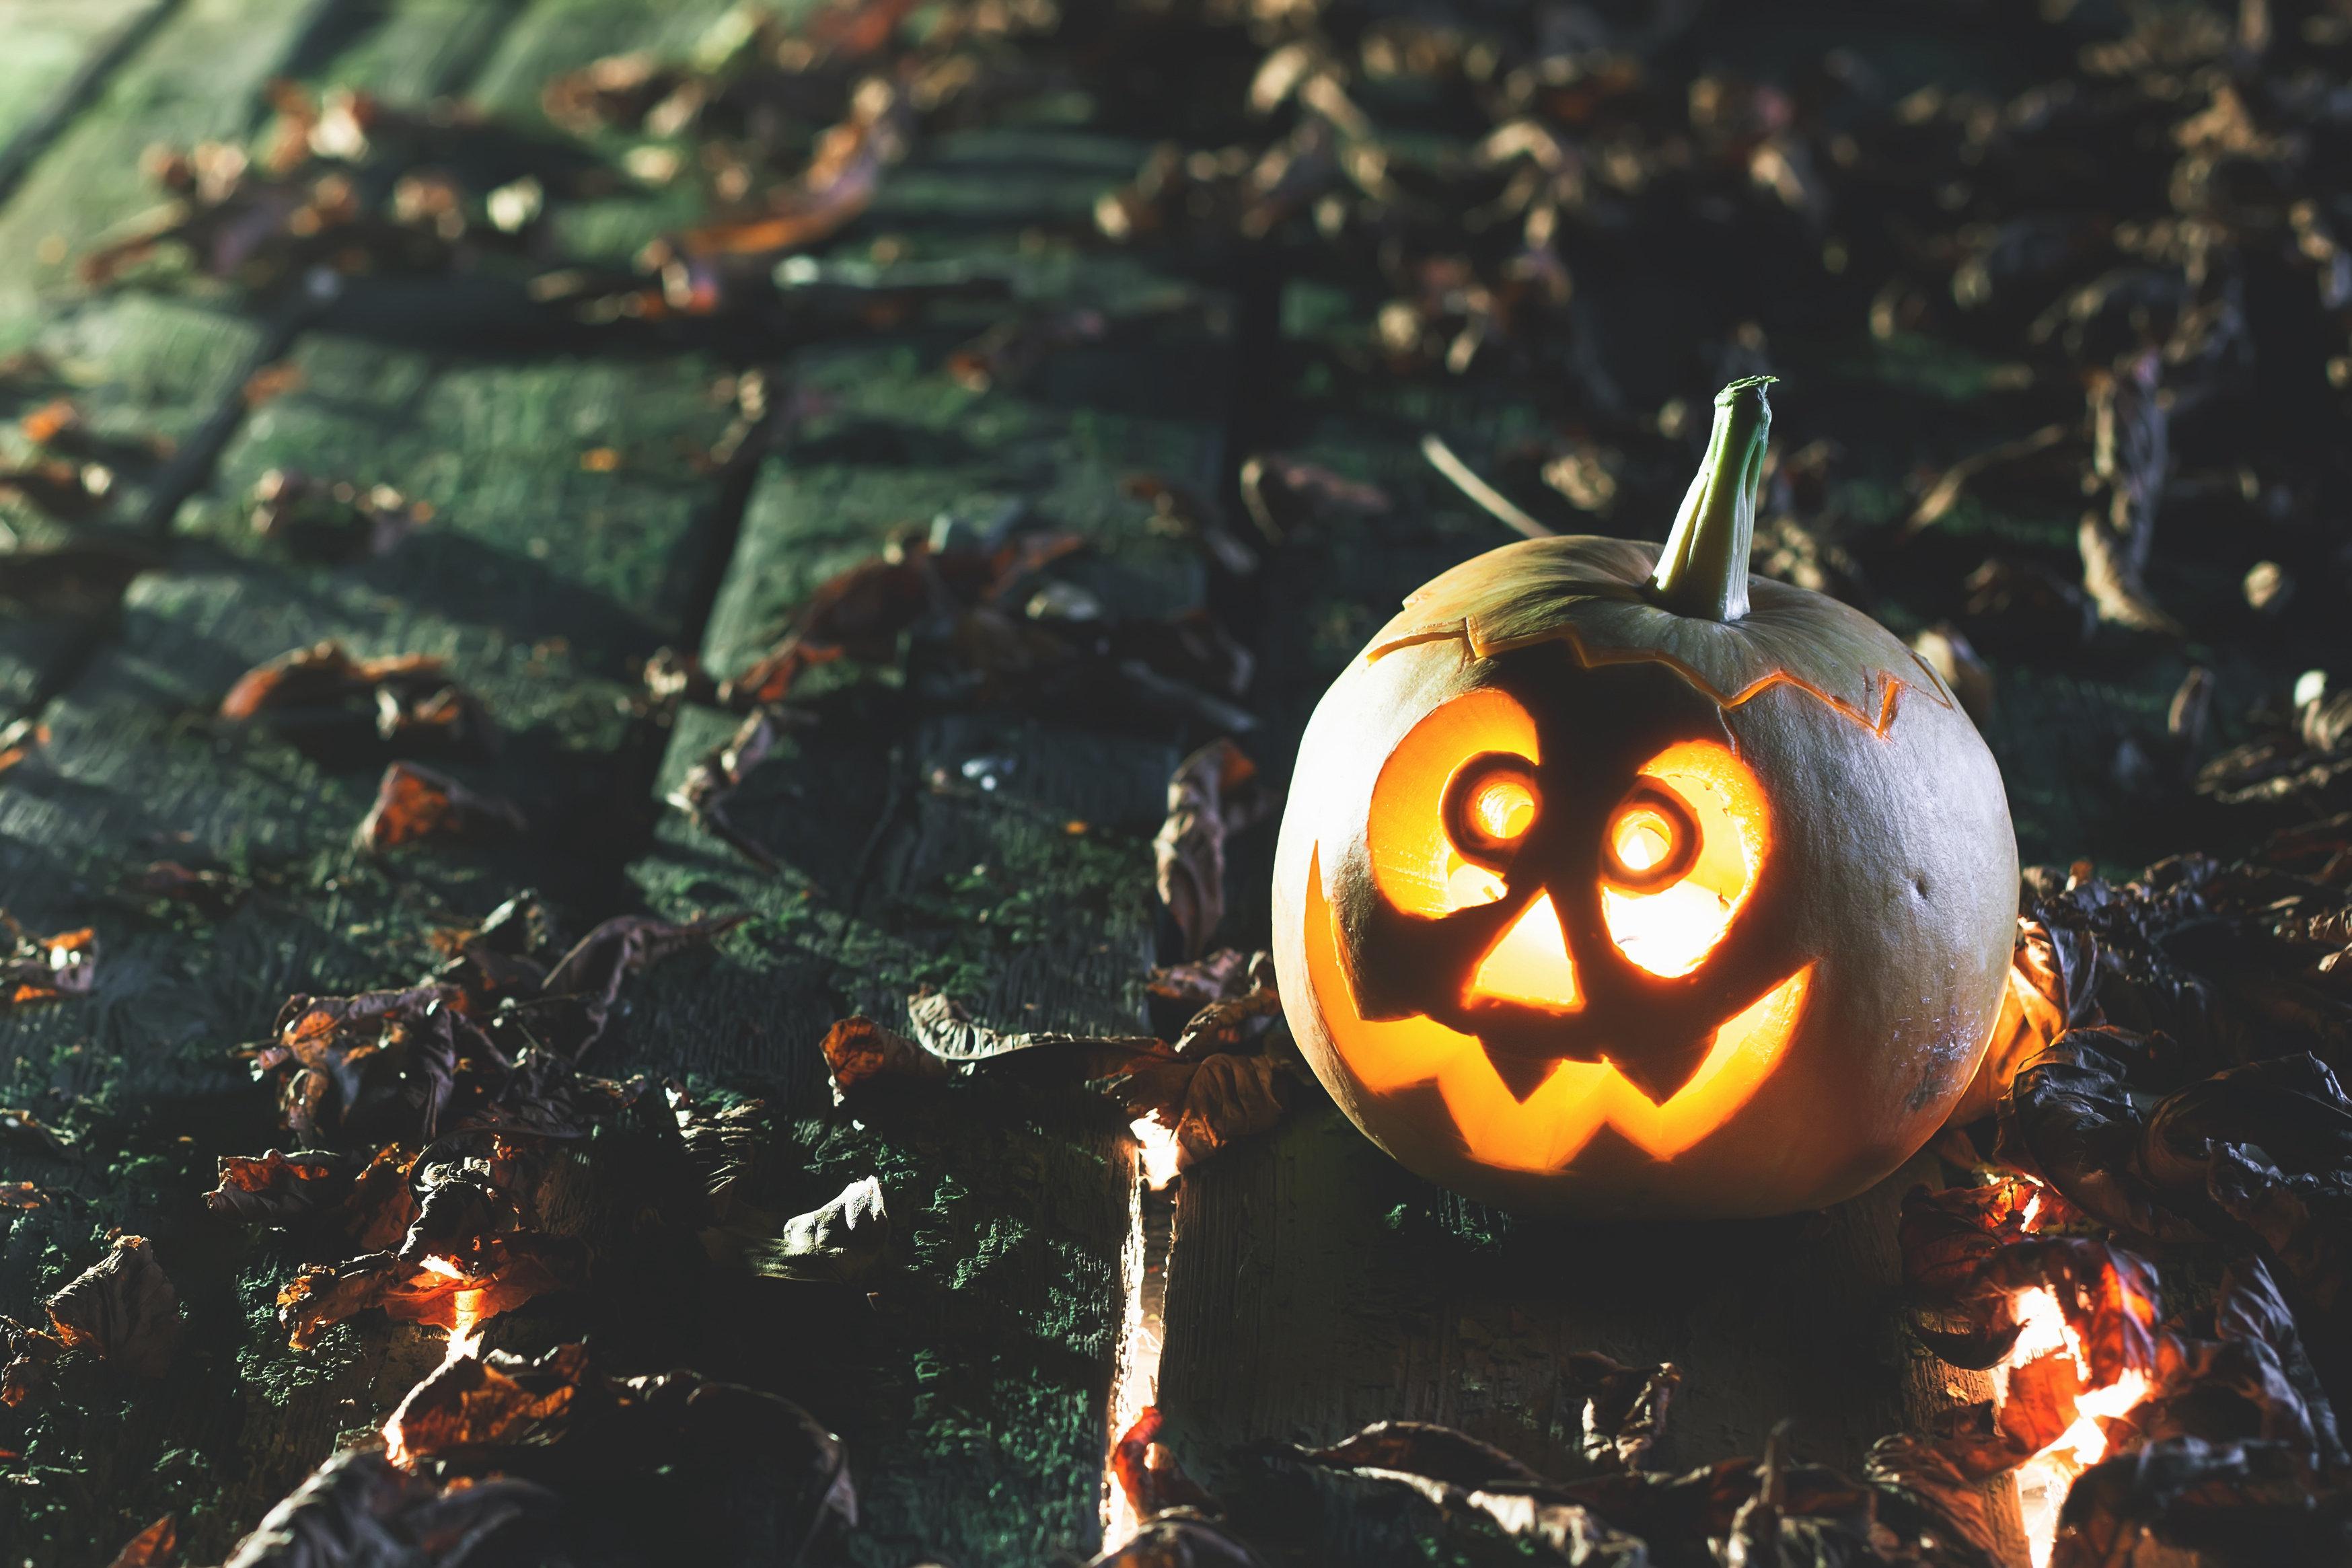 A baby born on Halloween was named Oskar Frankenstein.